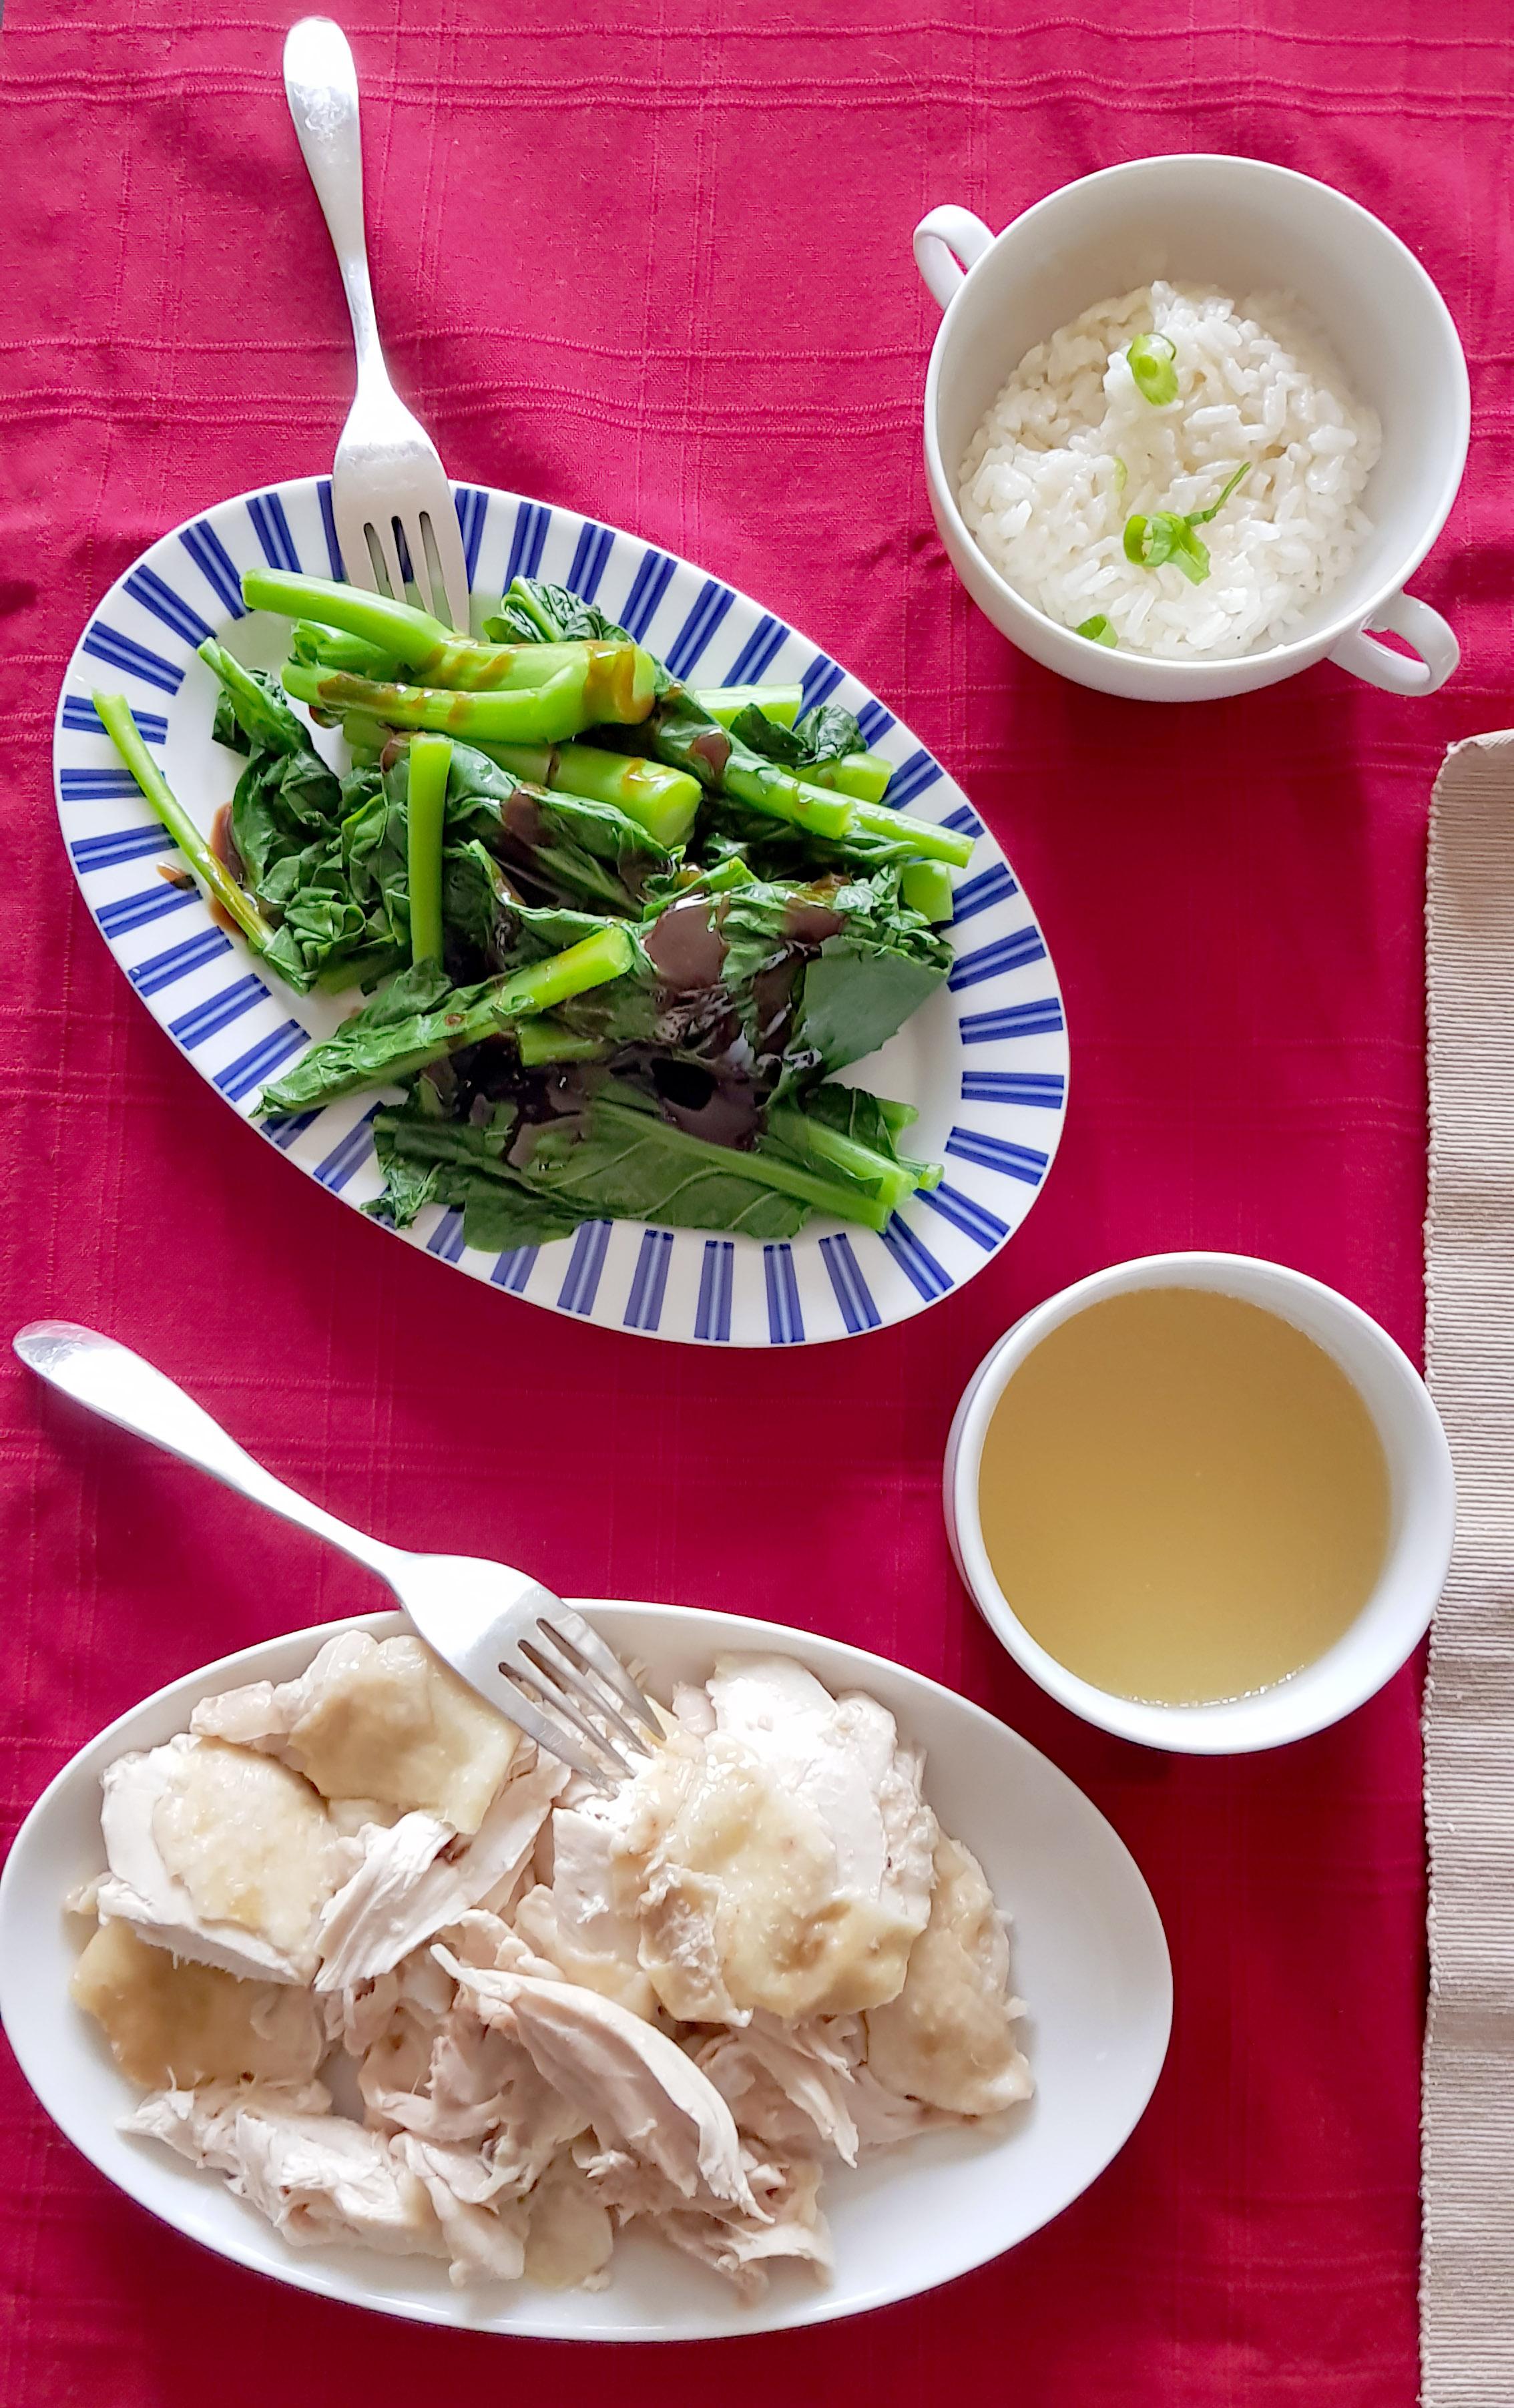 Hainan Chicken and Rice Gai lan Chinese Broccoli recipe Cantonese food